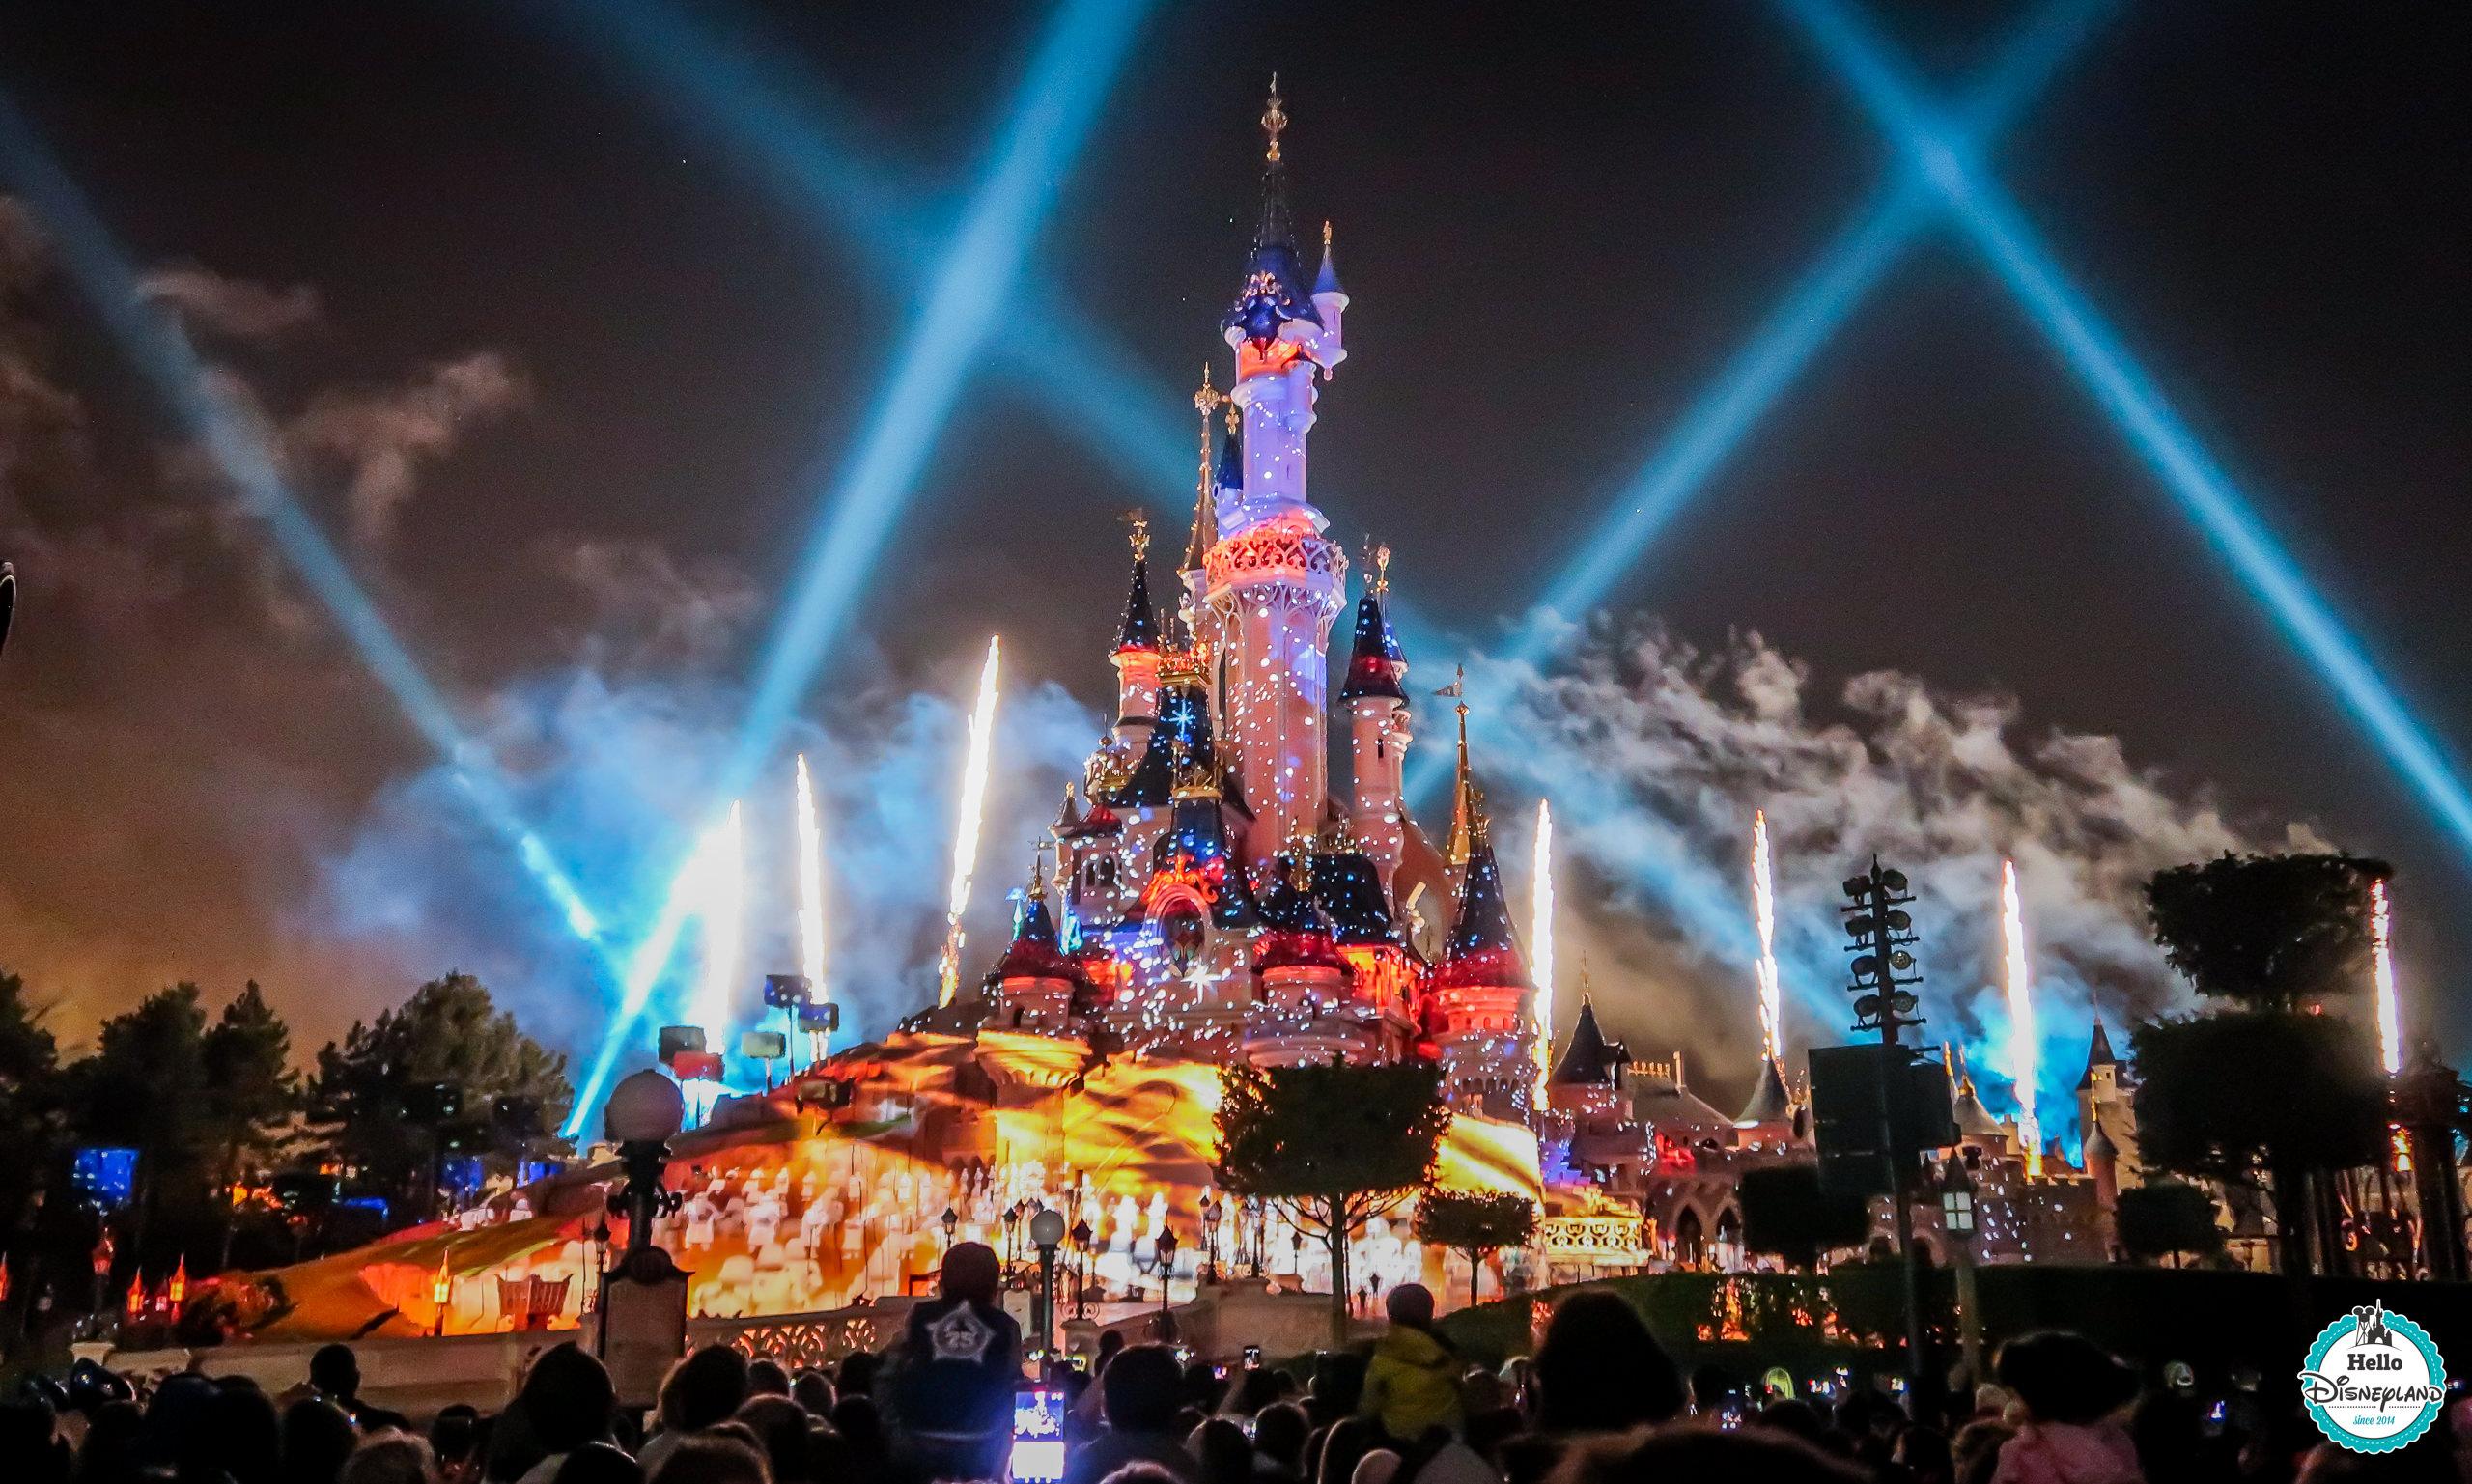 Hello disneyland le blog n 1 sur disneyland paris disney illuminations o se placer - Disneyland paris noel 2017 ...